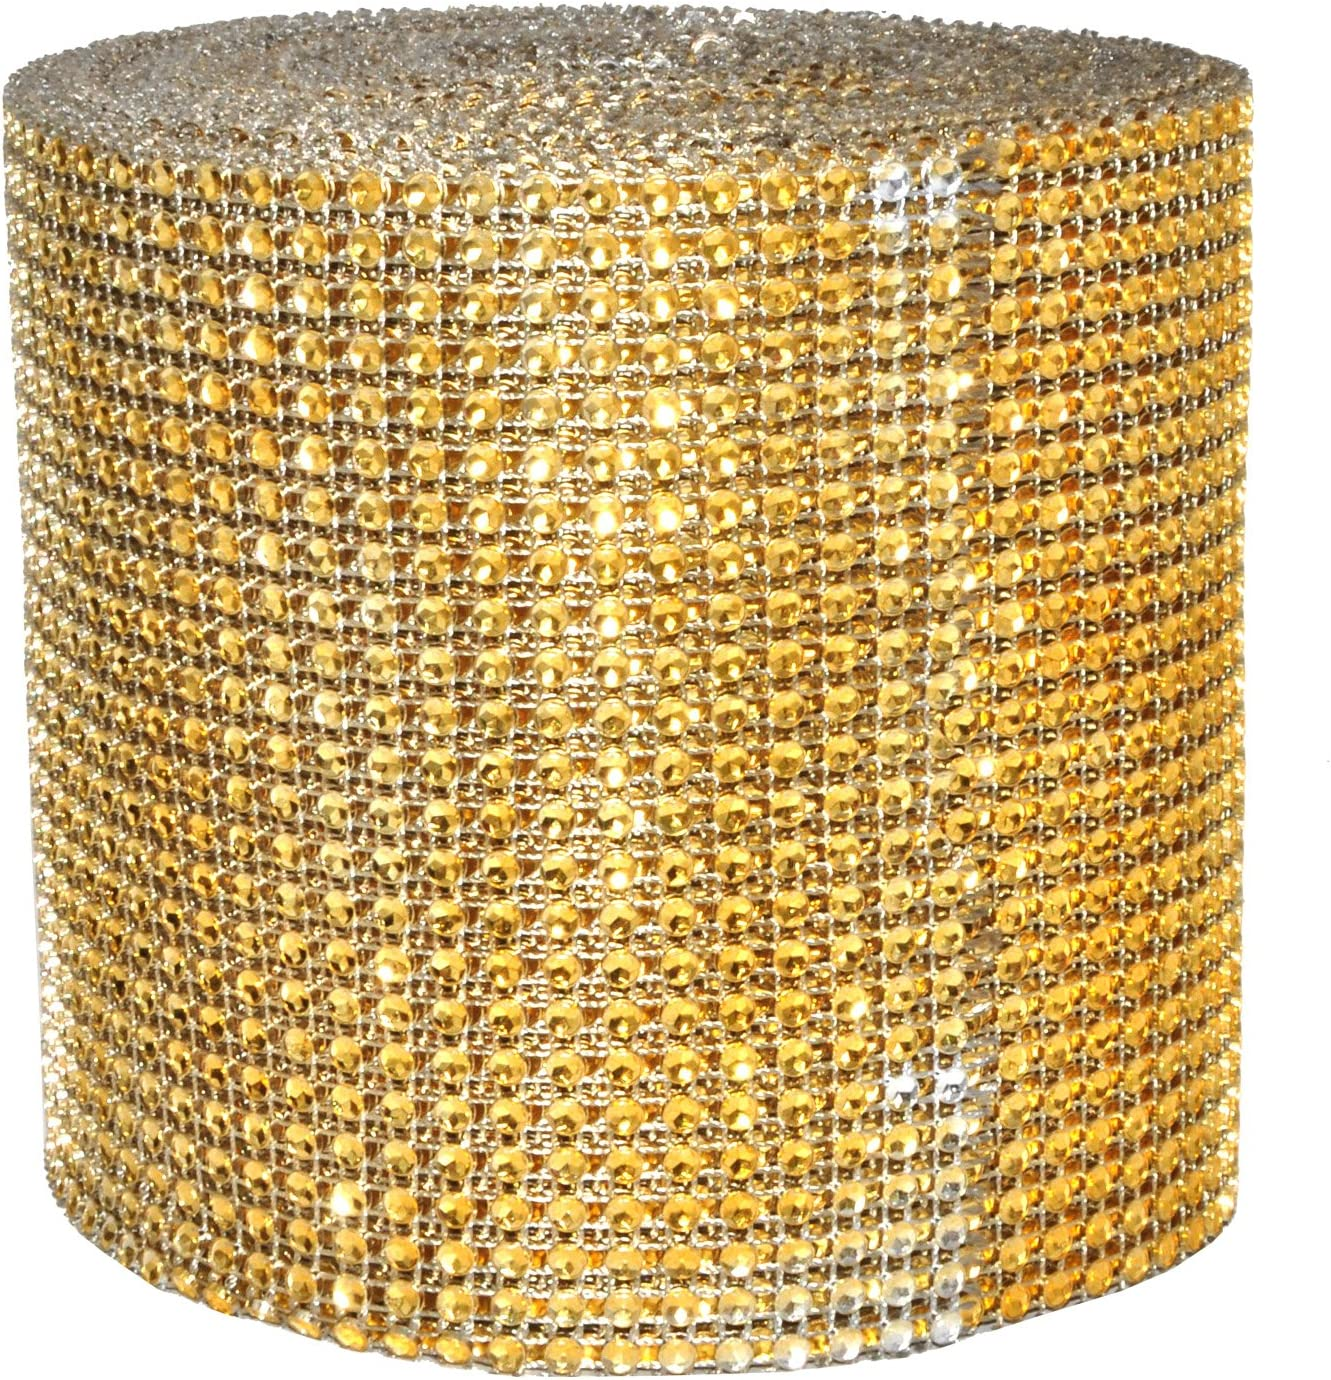 1 Inch 5 Rows 20 Yards 2 Rolls, Turquoise Mandala Crafts Bling Sparkling Acrylic Diamond Rhinestone Crystal Mesh Wrap Ribbon Roll for Cake Vase Centerpiece Party Wedding Decoration